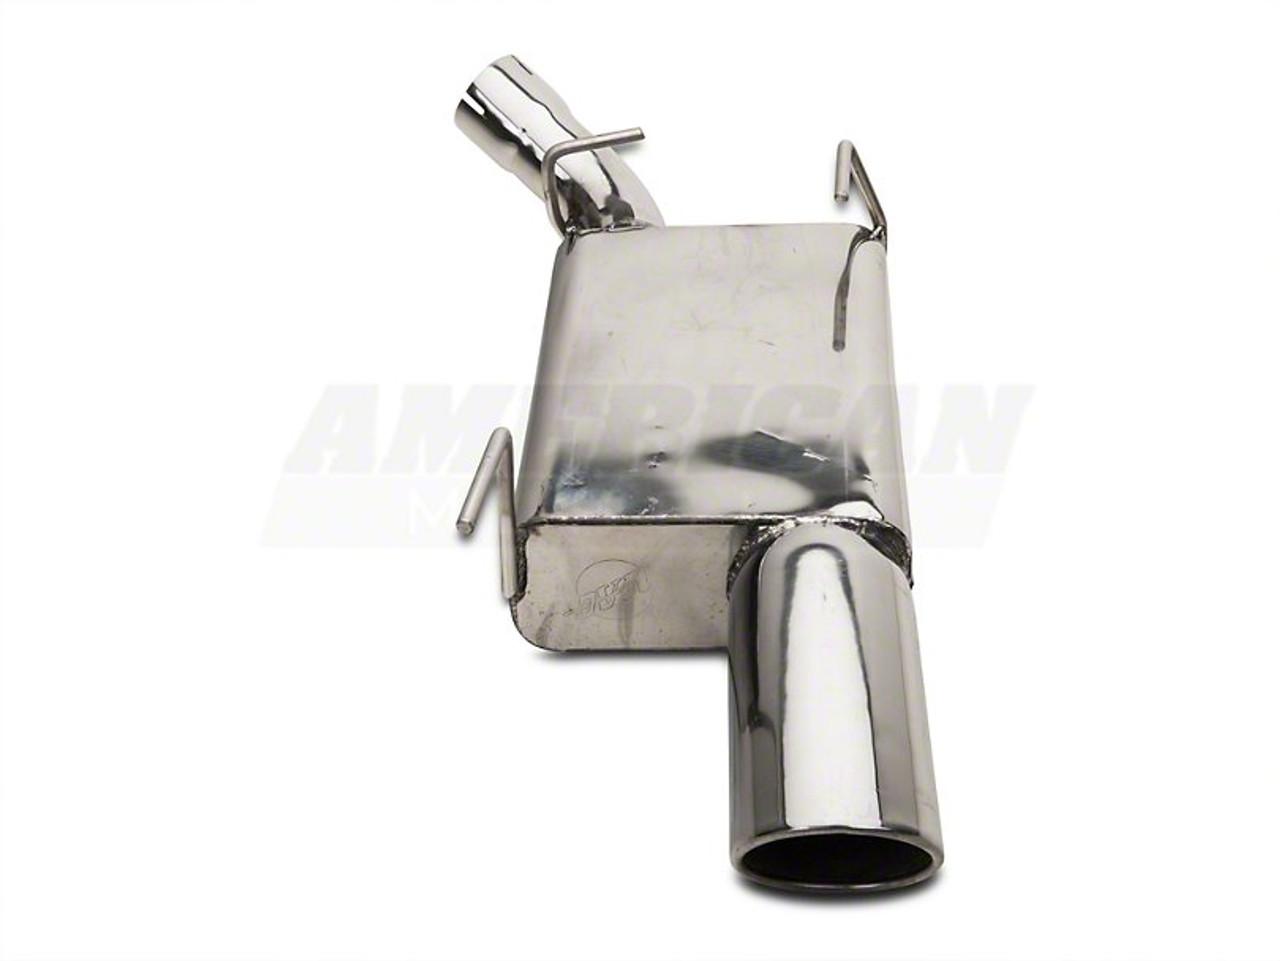 mac axle back exhaust 05 09 v6